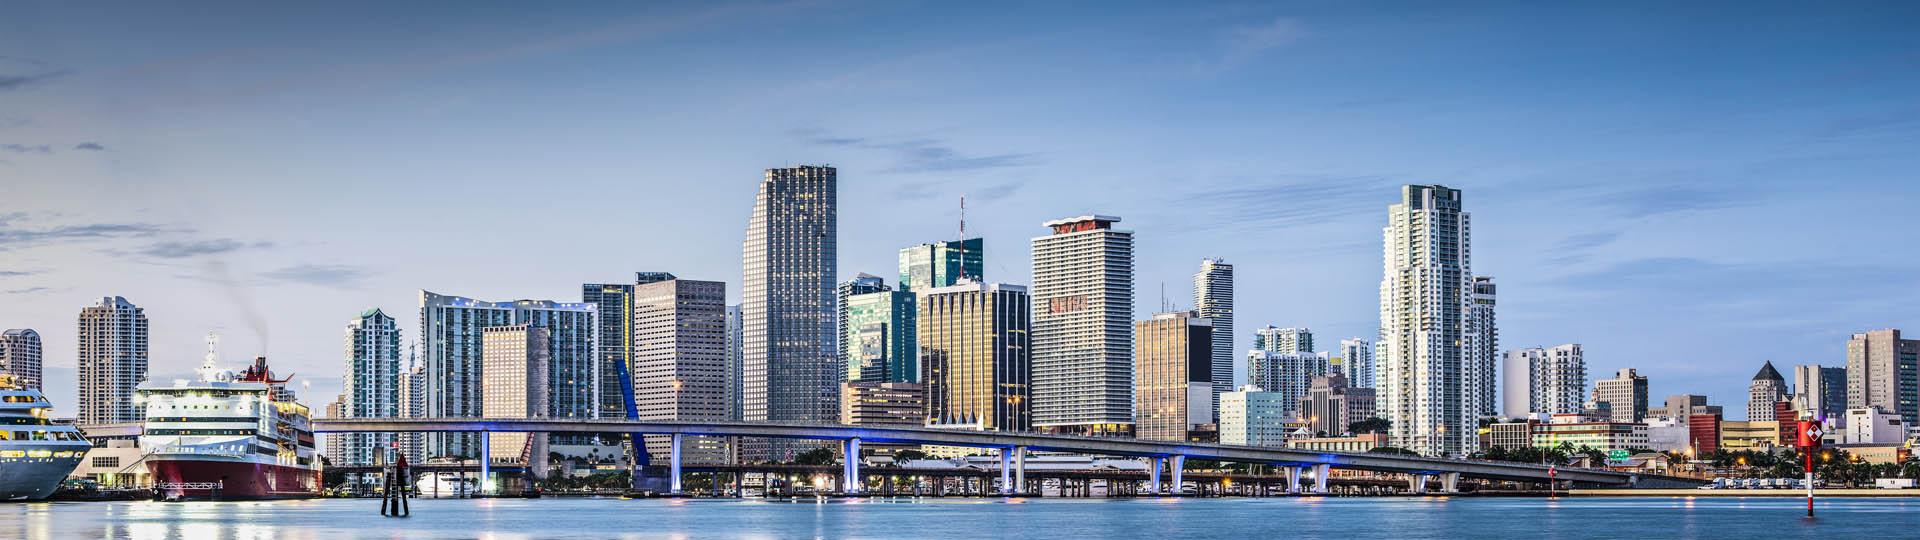 Investors In Miami, Florida